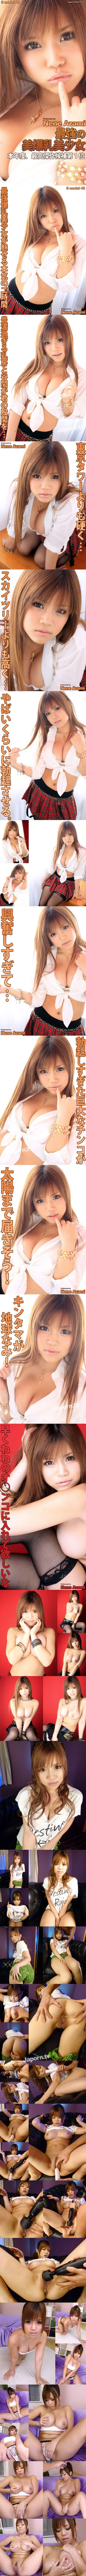 [SMD 48] S Model 48 : Nene Azami あざみねね SMD Nene Azami